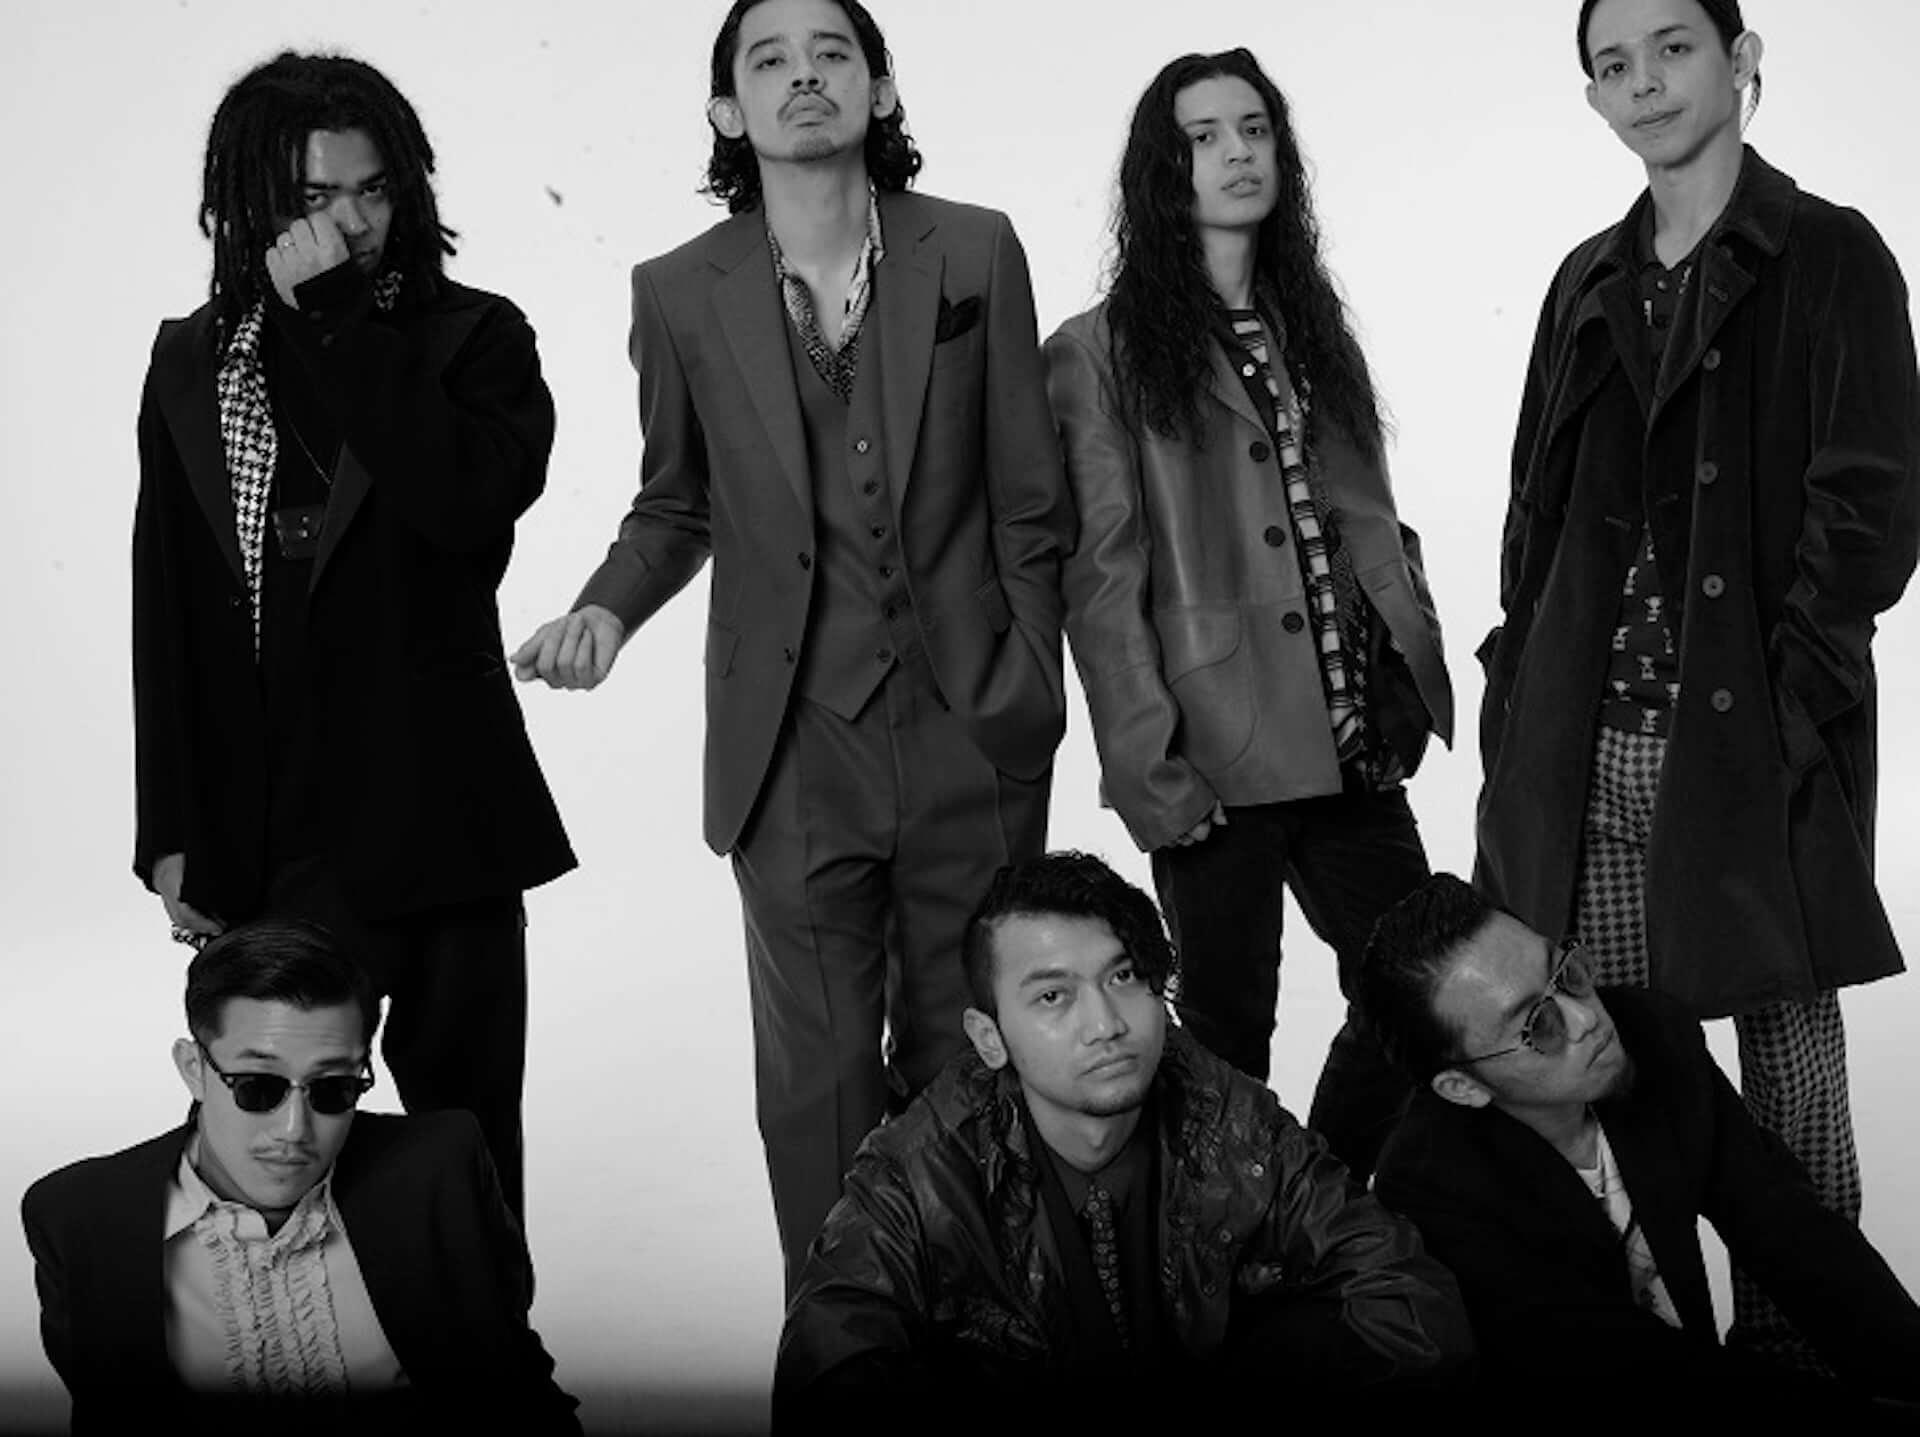 ALIの新EP『LOVE, MUSIC AND DANCE』が発売決定!梅田サイファー、なみちえ、Shing02、Dos Monos、HIYADAMらが参加 music201217_ali_1-1920x1437